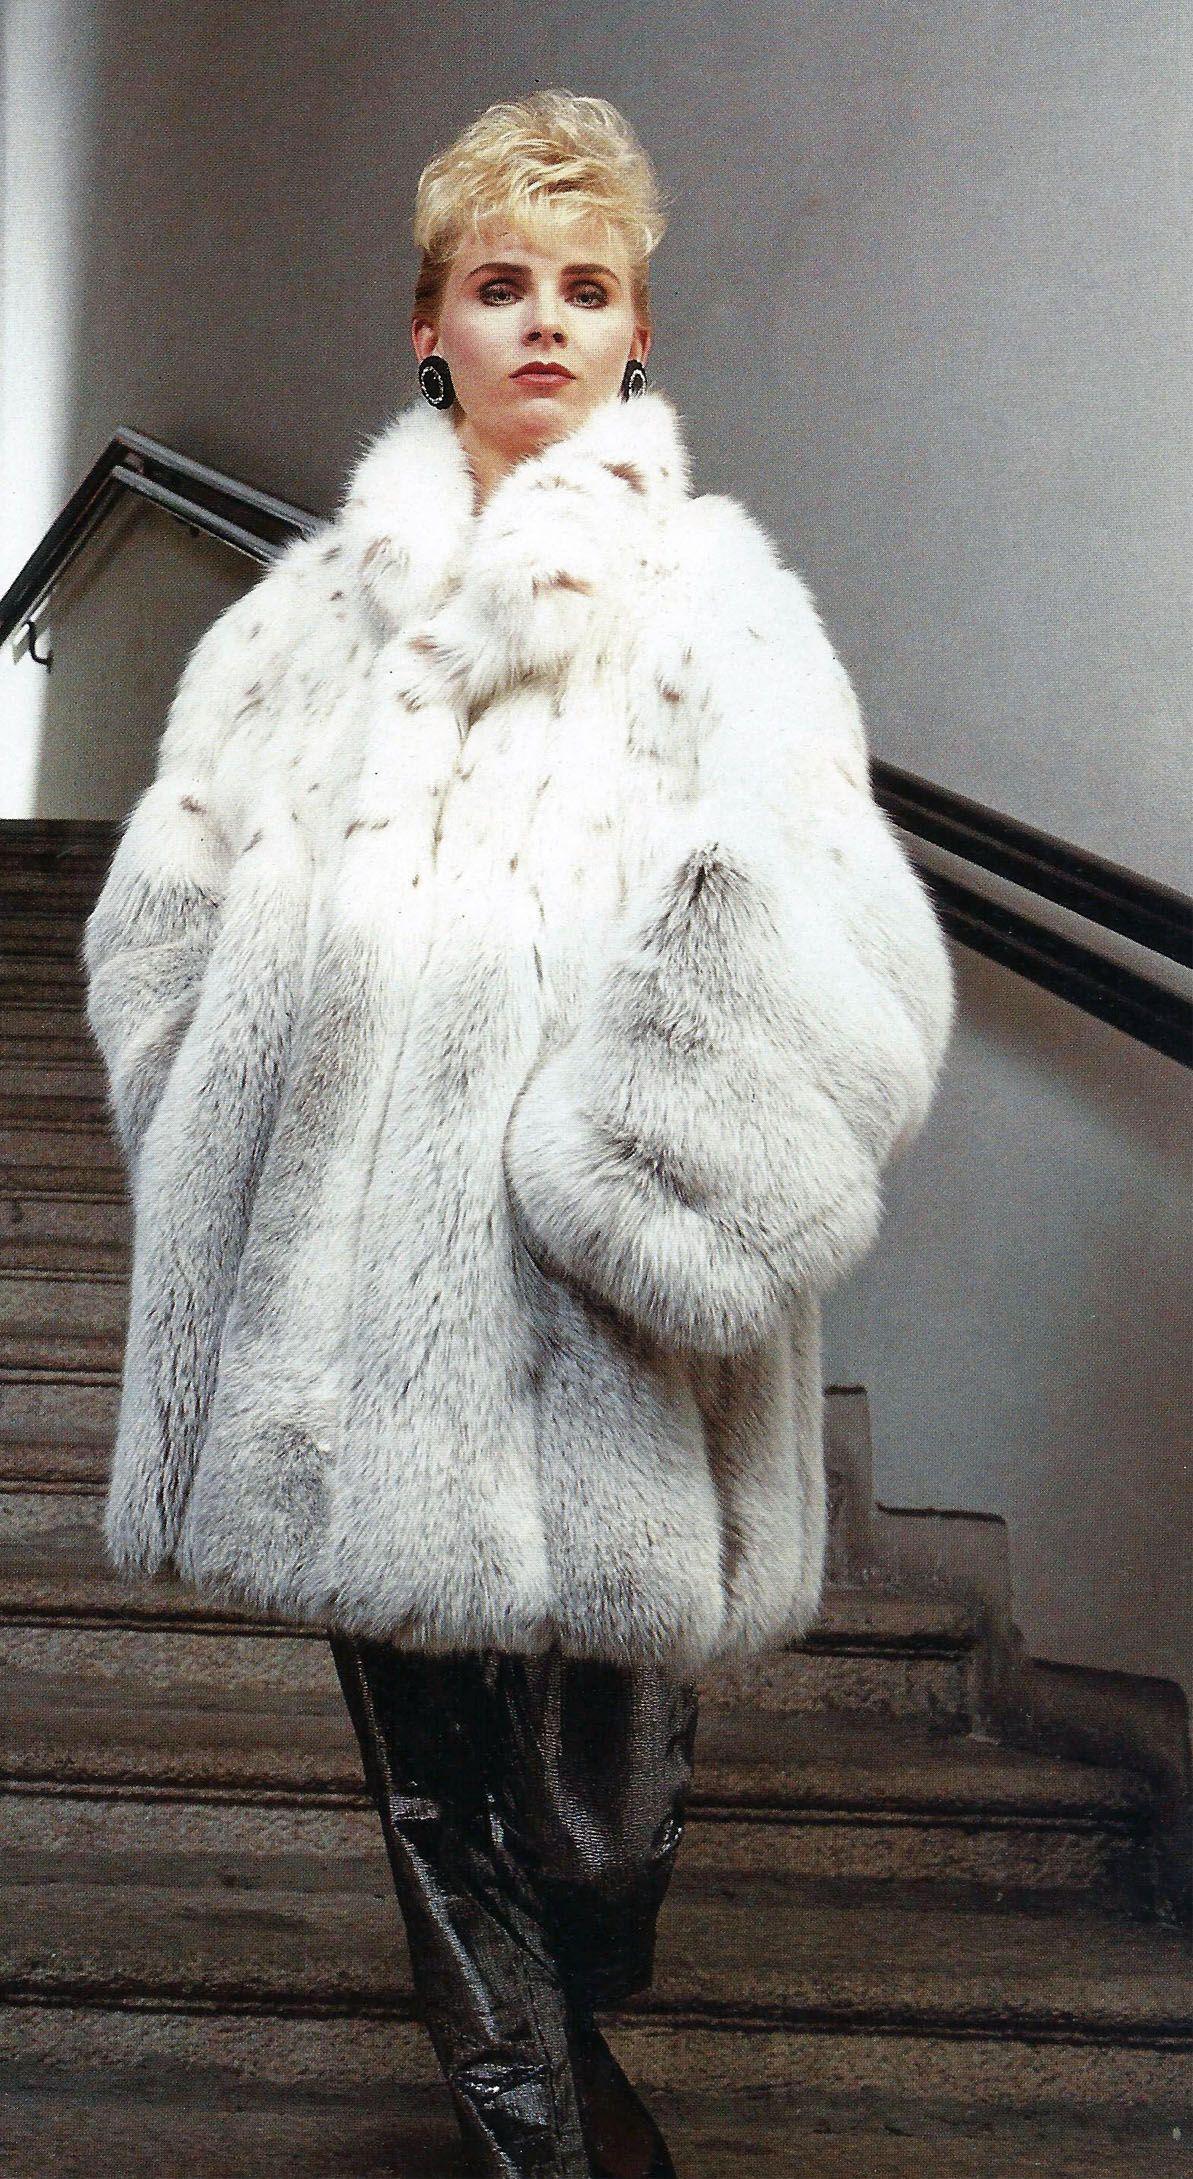 Madame fur fashion guide furs fashion photo gallery for Bilder fur kuchenwande